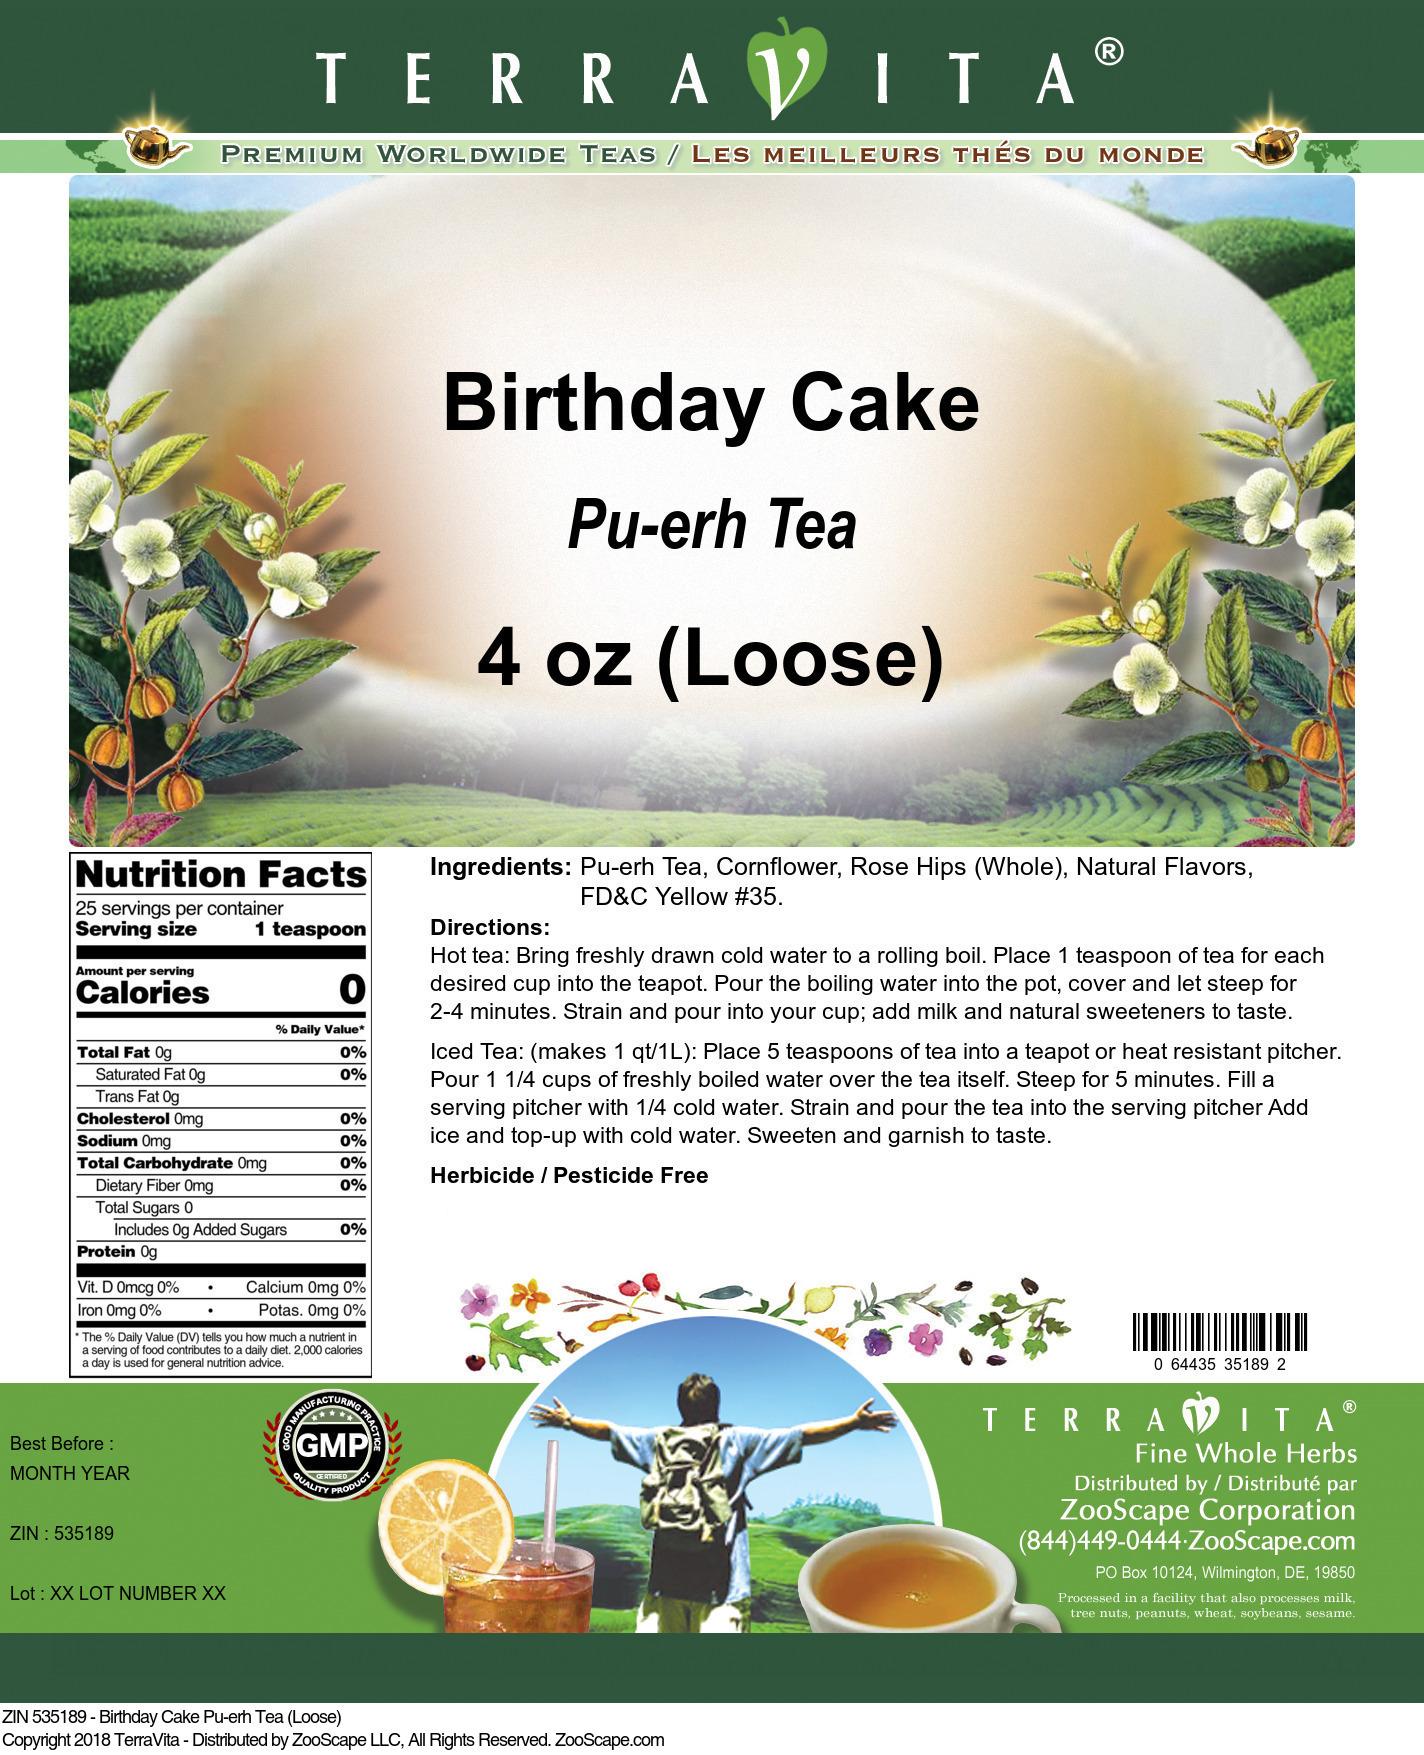 Birthday Cake Pu-erh Tea (Loose)